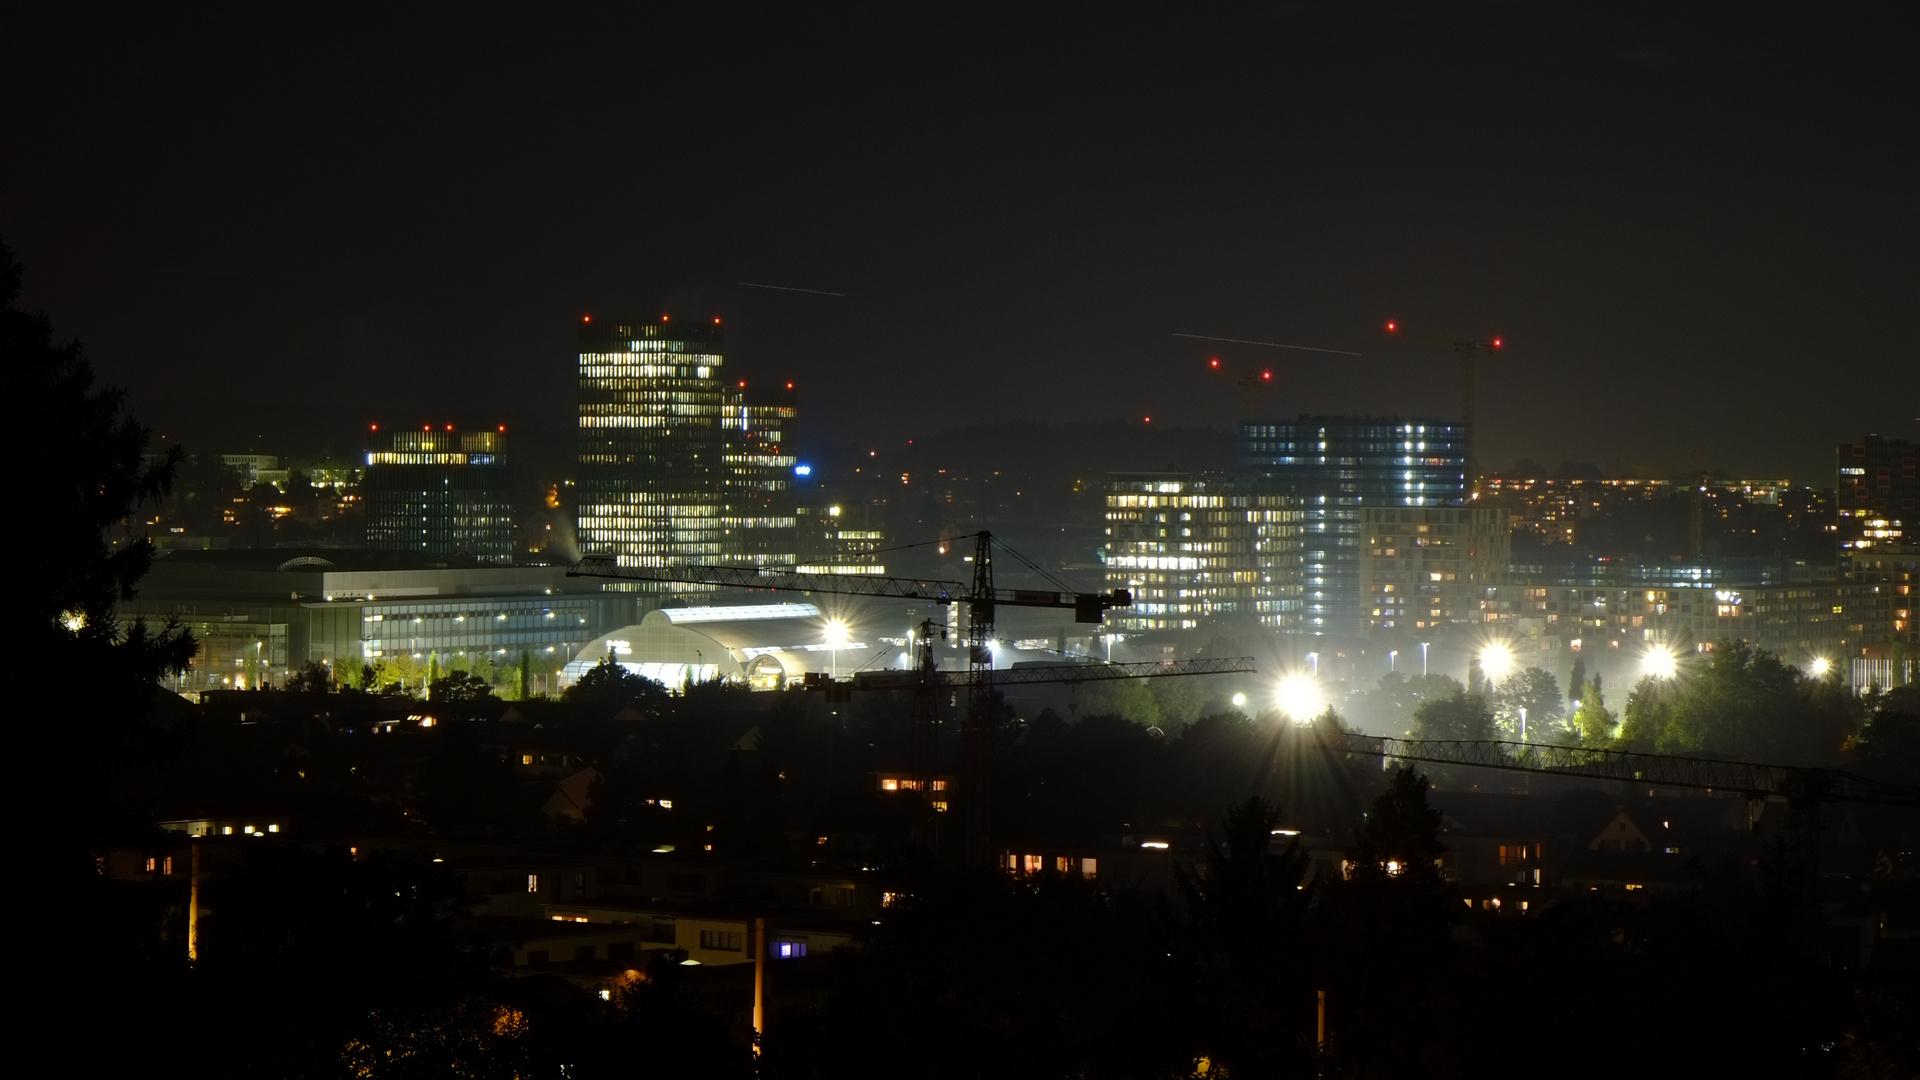 Züri-Nord by night